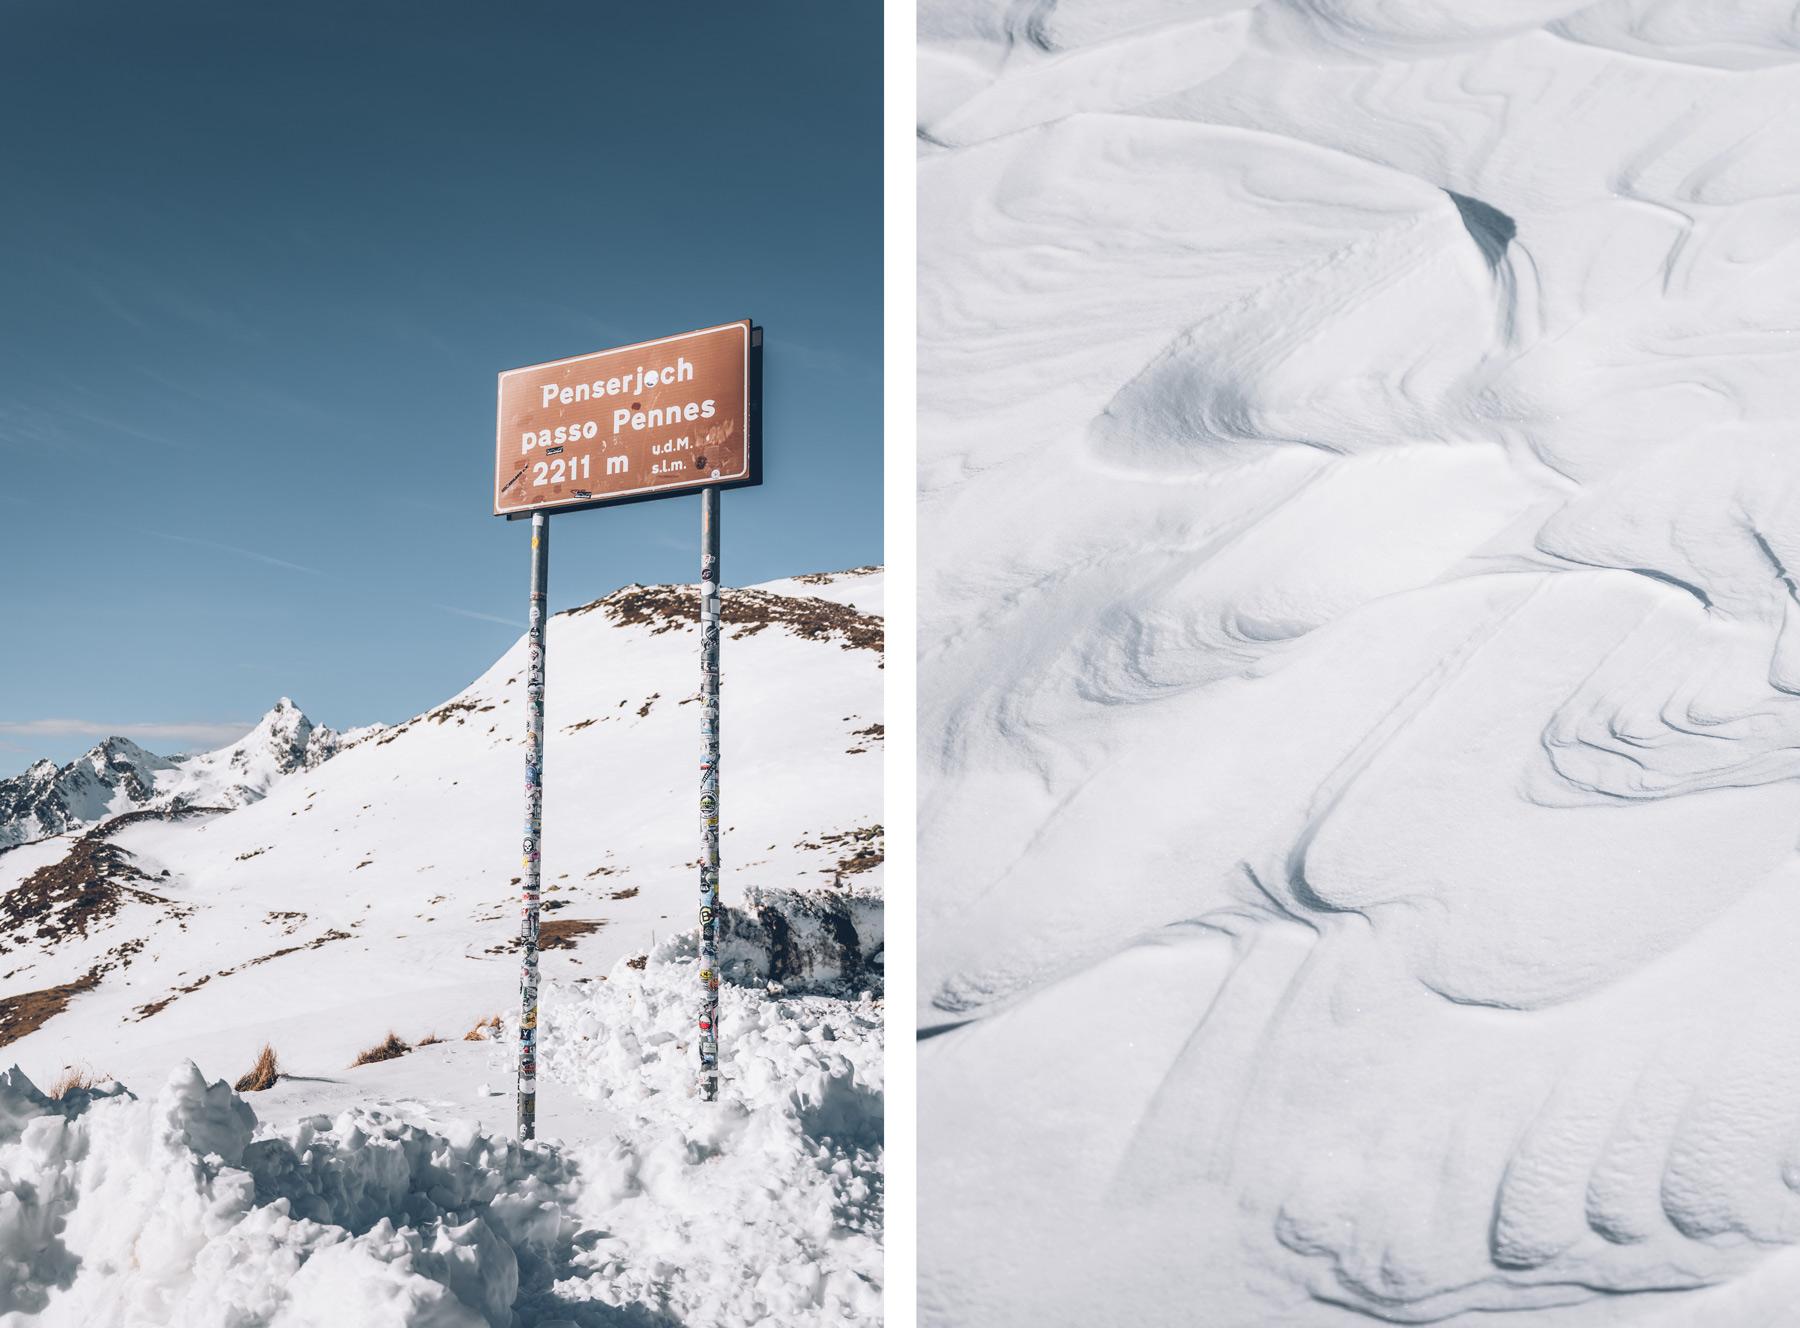 Passo Penne, Sud Tyrol